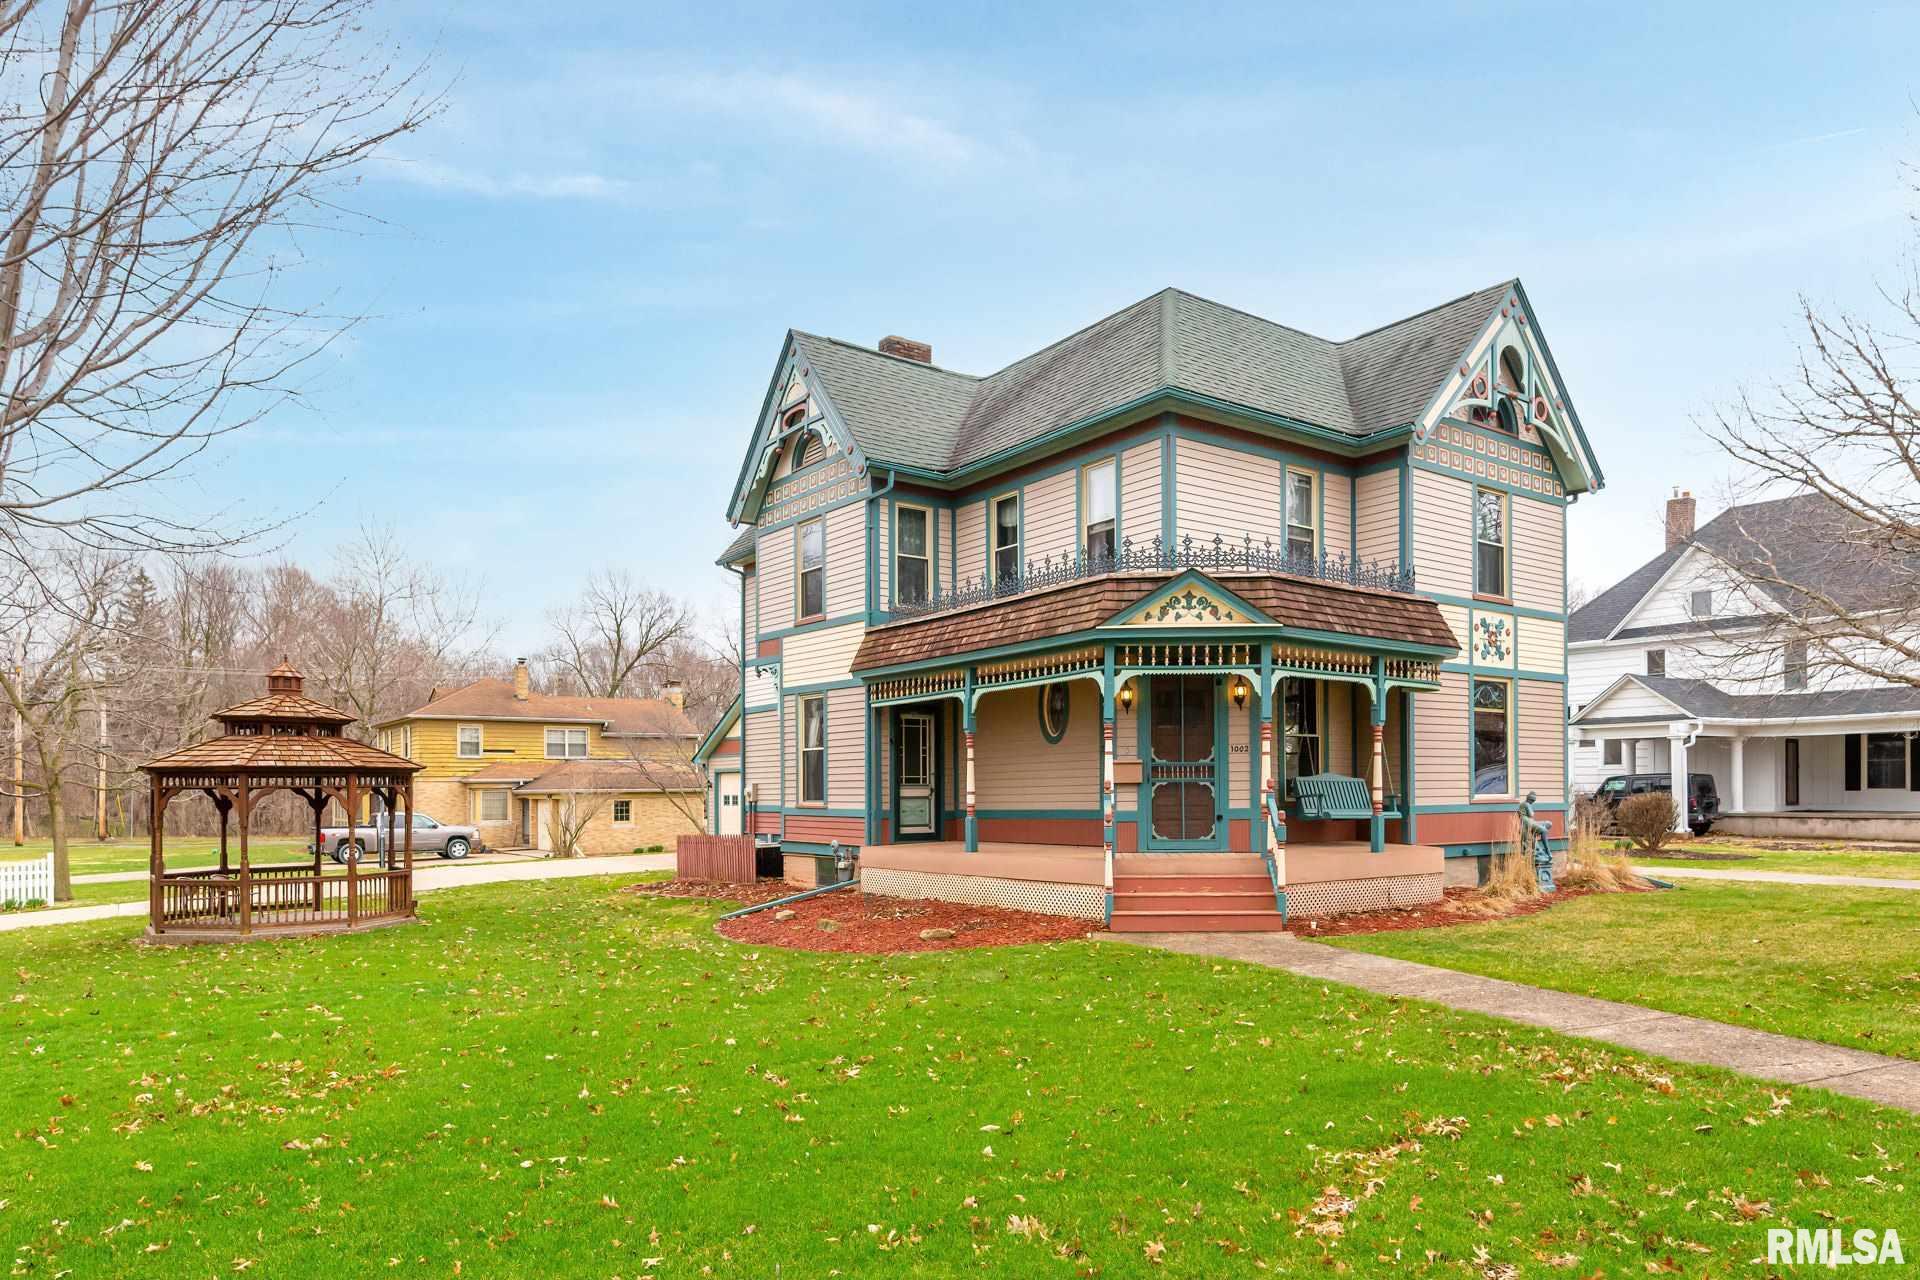 1002 S COLLEGE Property Photo - Aledo, IL real estate listing